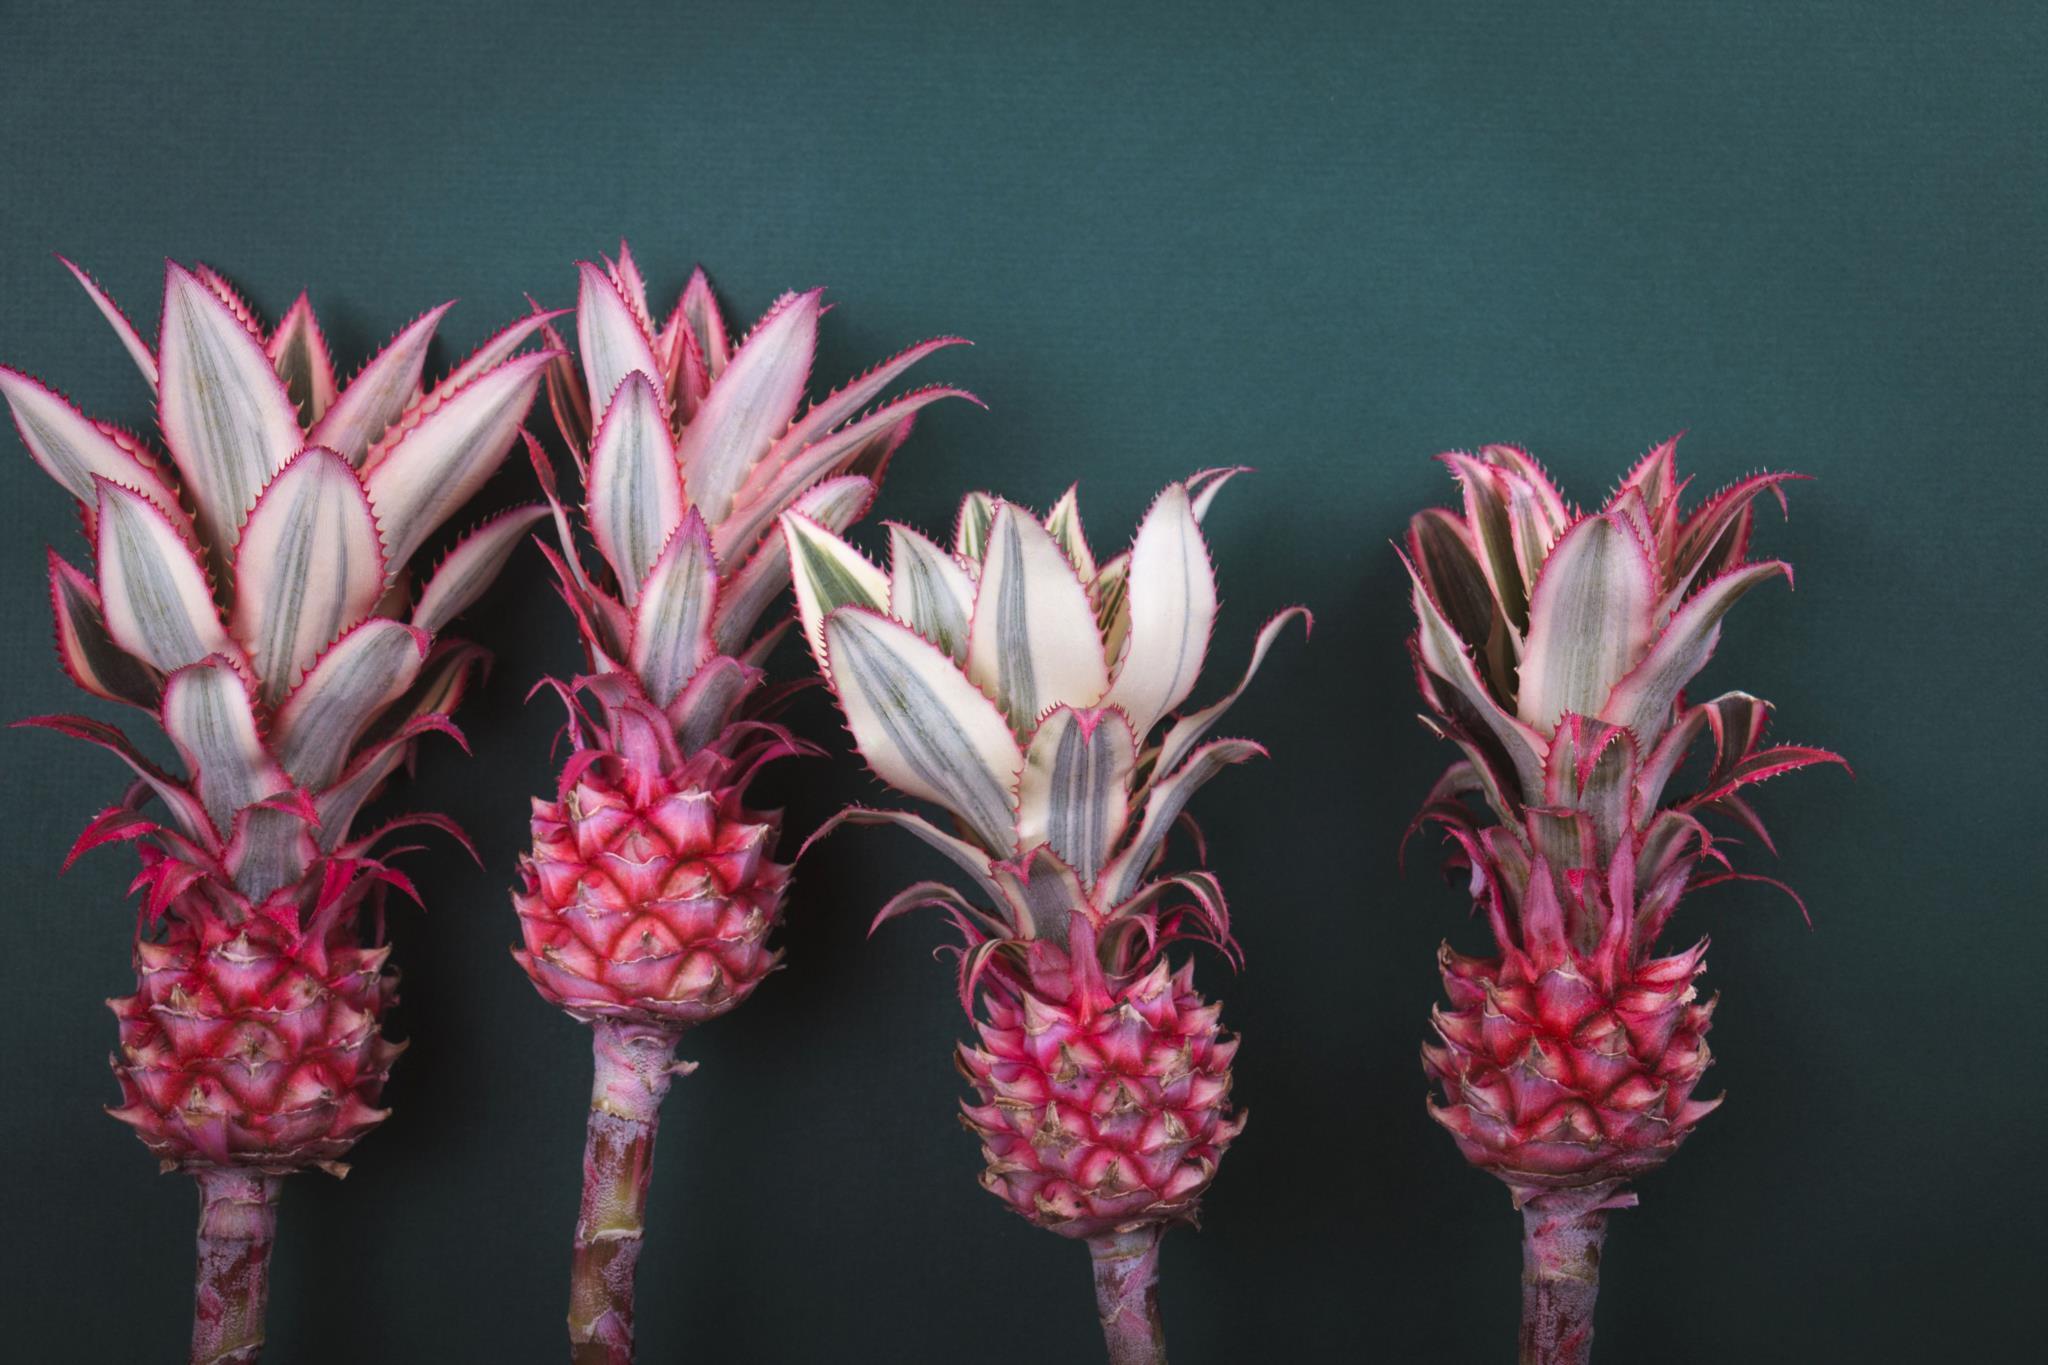 Apesar de ser geneticamente modificado, o abacaxi rosa é seguro, diz a FDA